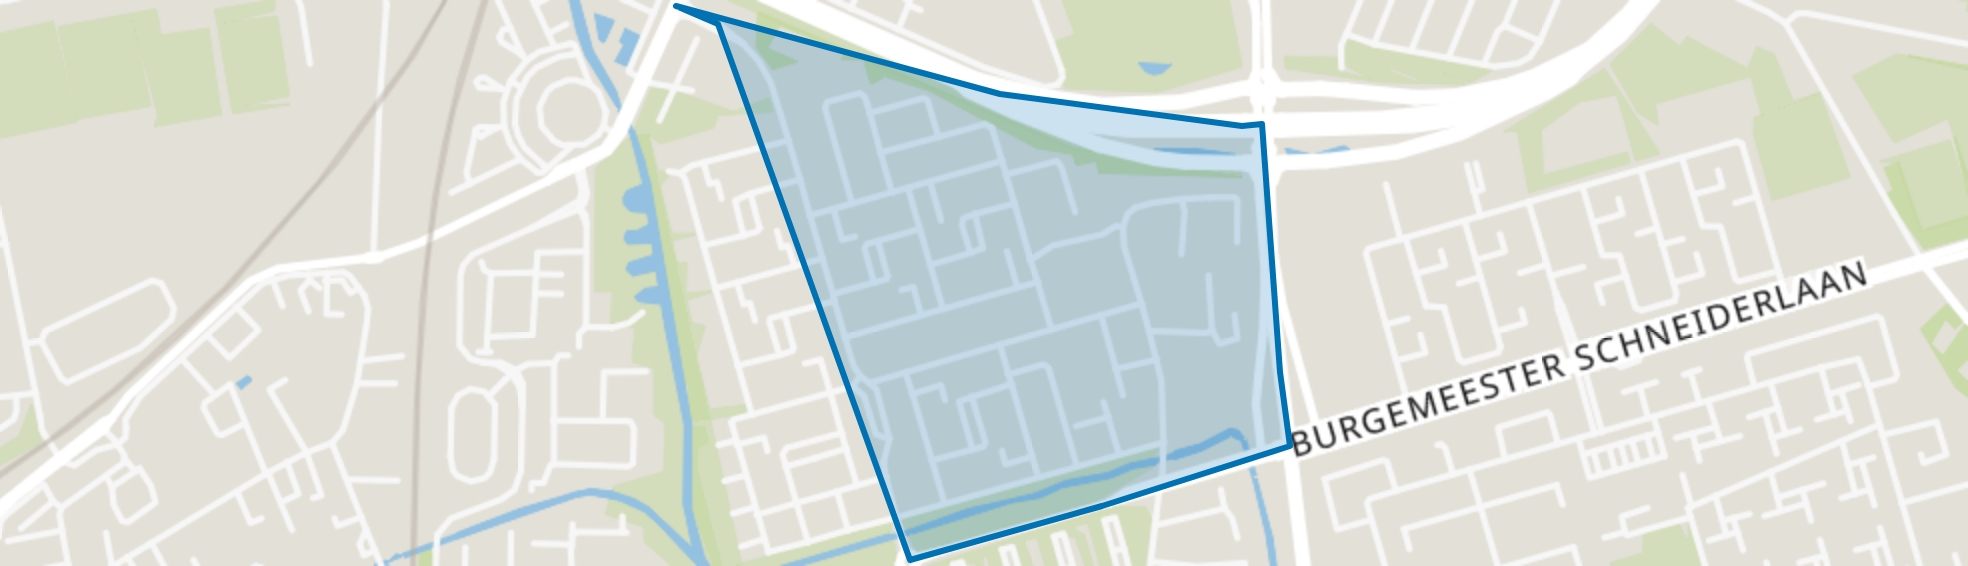 Kroeven-Noordoost, Roosendaal map